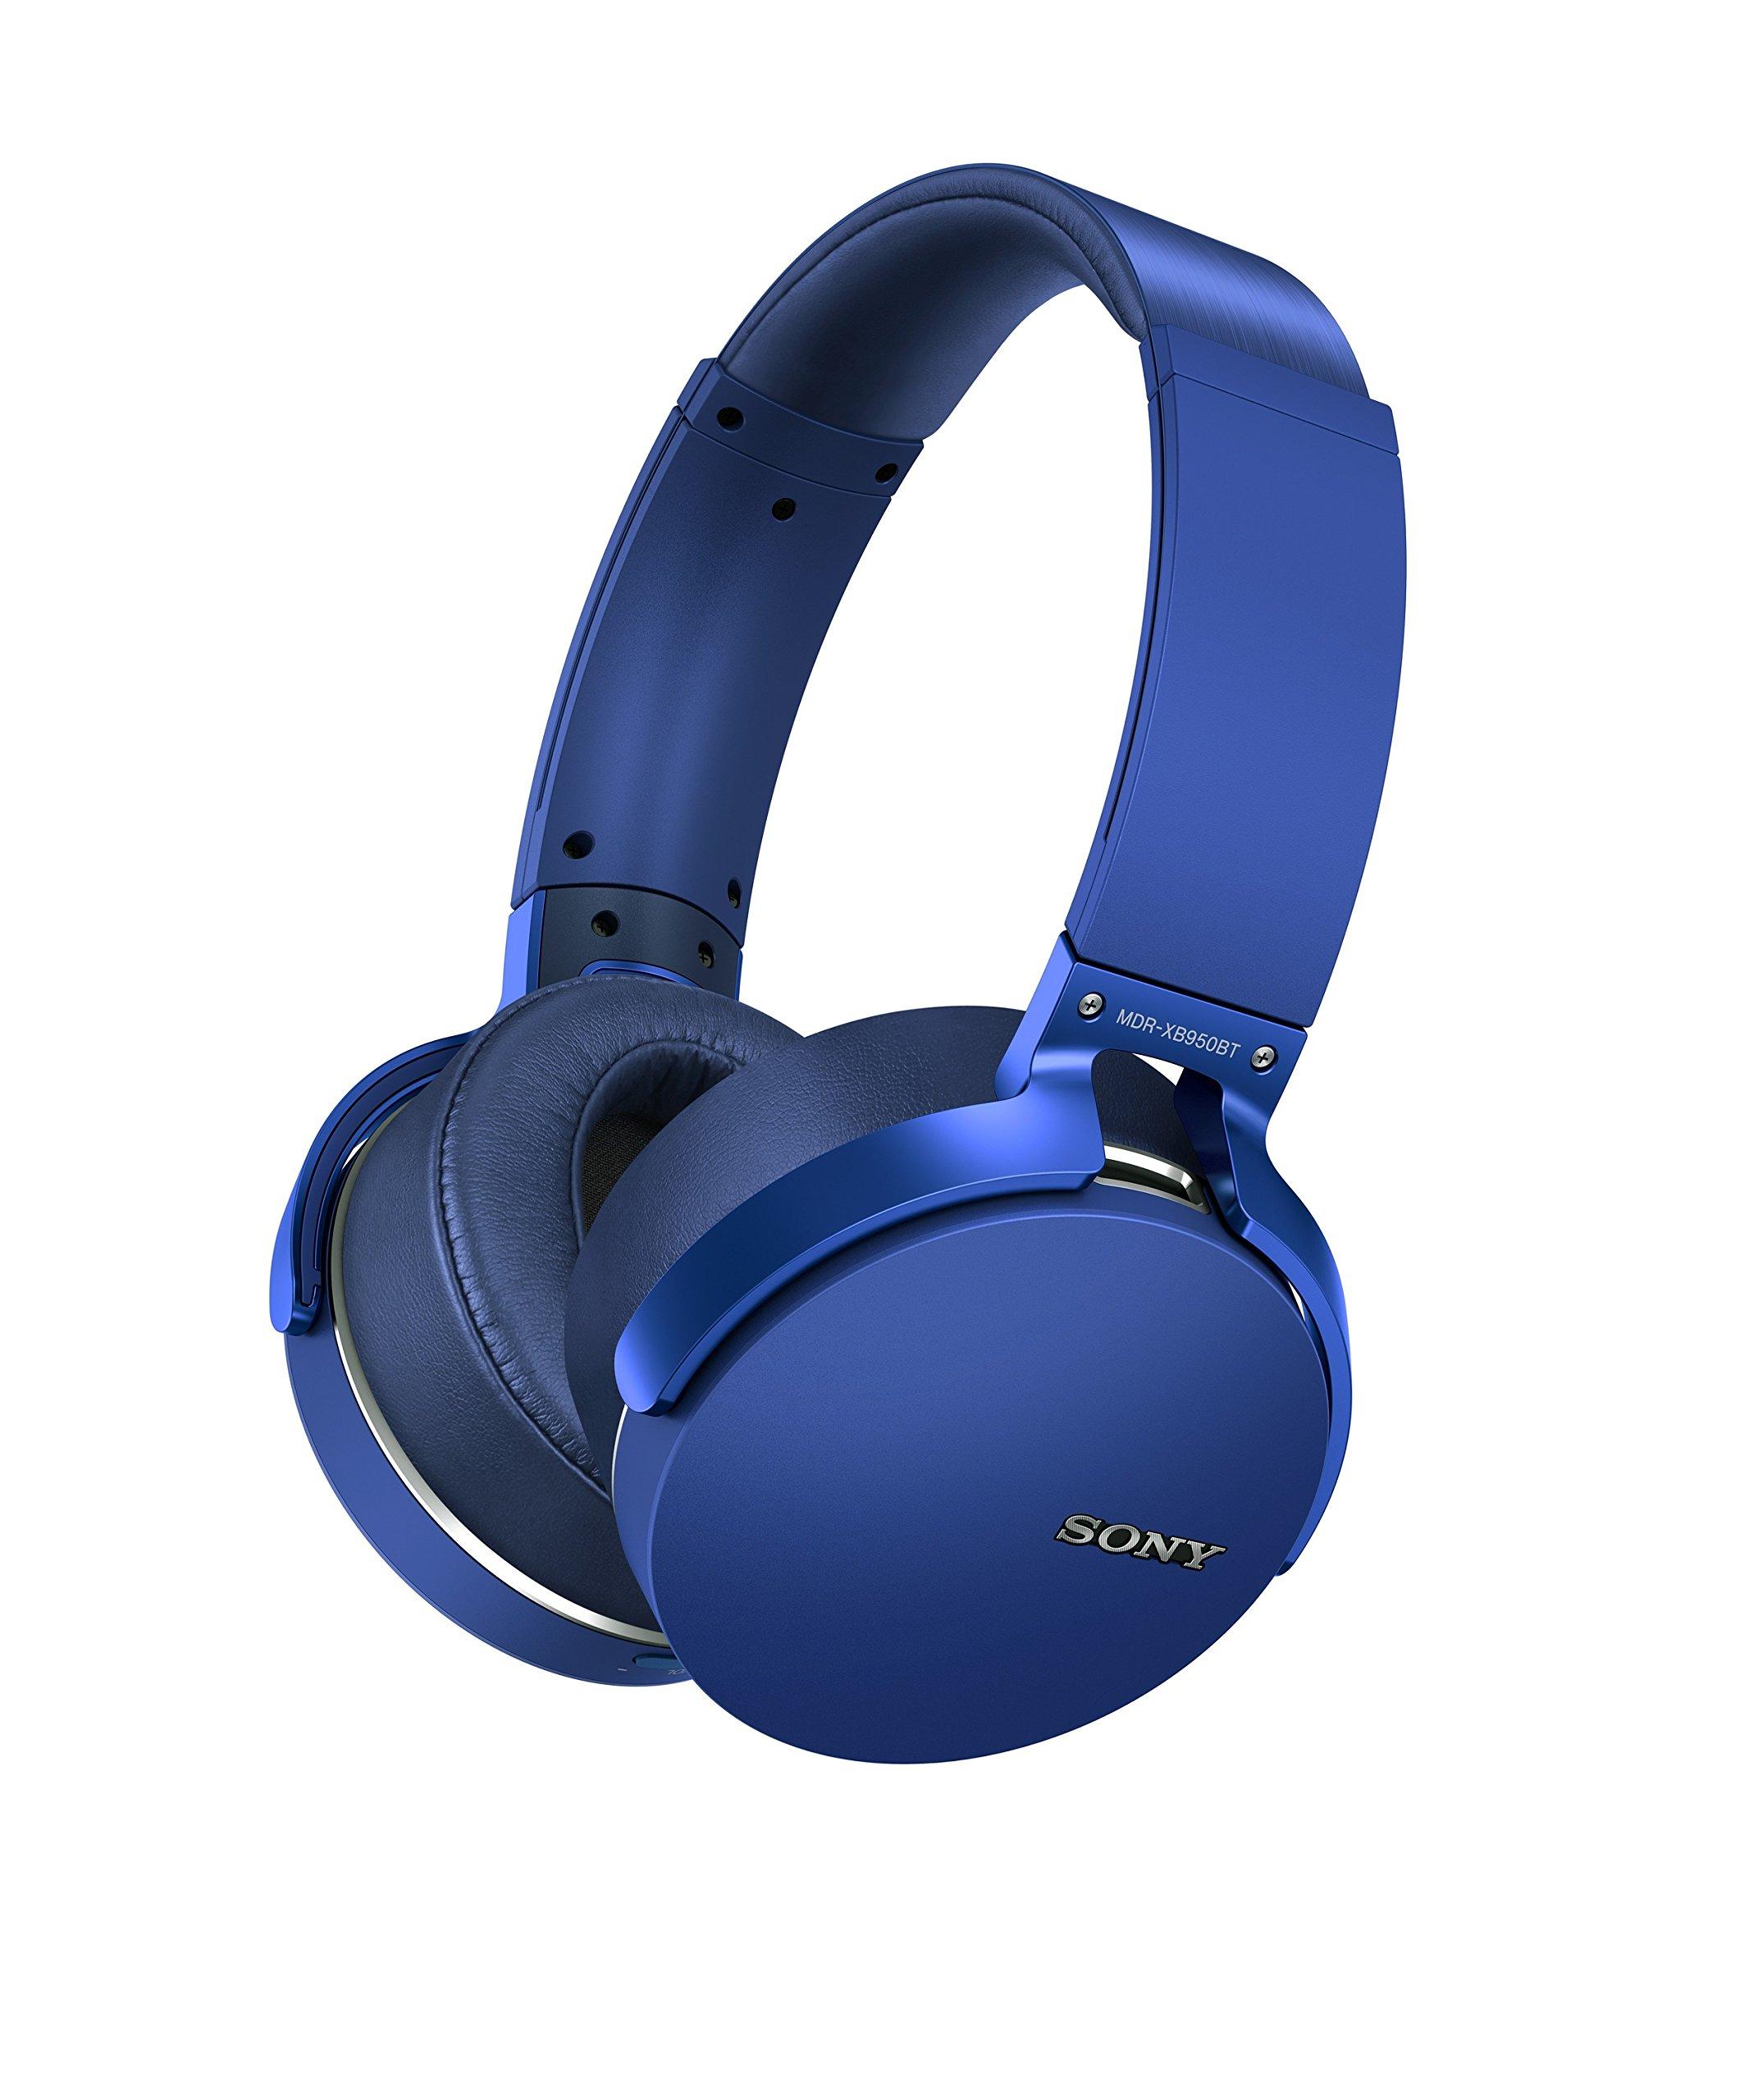 Sony MDRXB950B1 / L Auriculares Bluetooth extra bajos azul